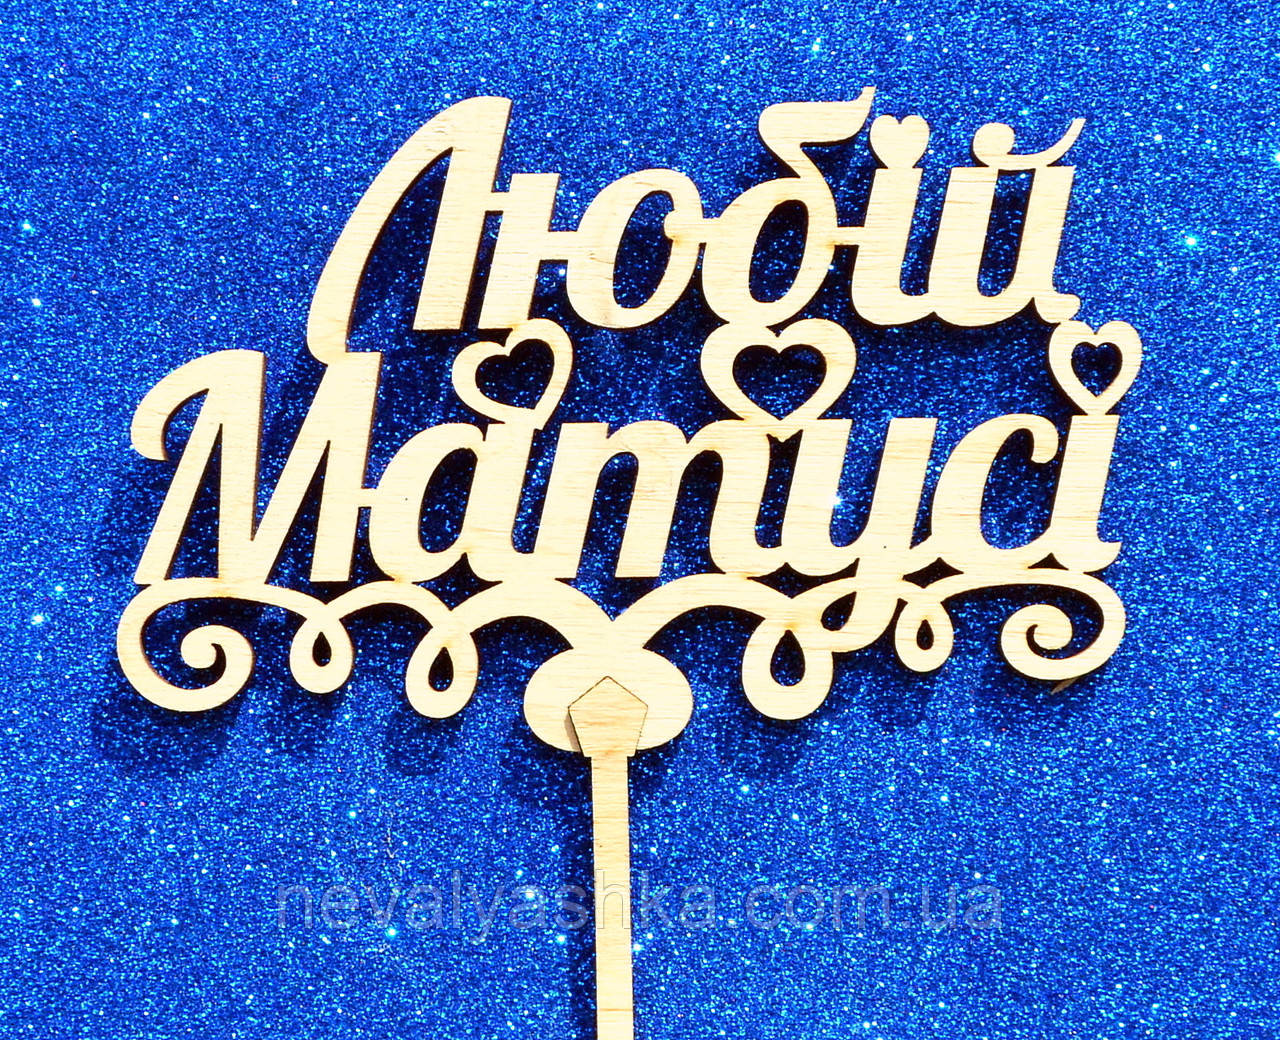 ТОППЕР Деревянный ЛЮБІЙ МАТУСІ Маме Мамочке Топперы для Торта Топер дерев'яний из дерева на капкейки и торт